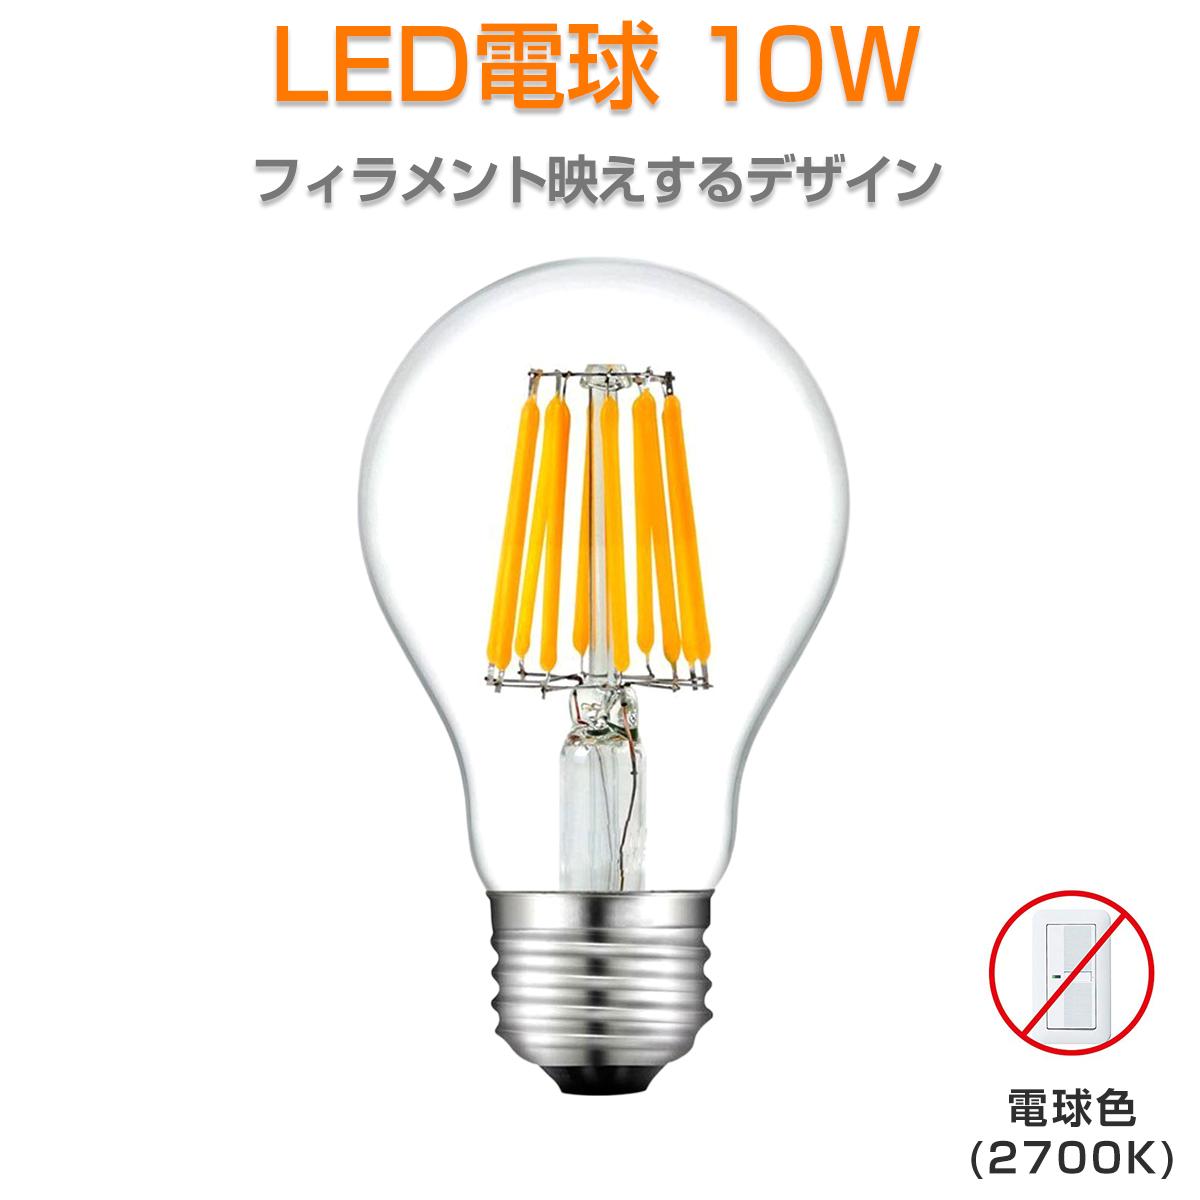 LED電球 フィラメント 10W 100W形相当 電球色(2700K) E26口金 A60 レトロエジソン クリアガラス 一般電球 全方向タイプ 調光器 ホタルスイッチ非対応 1個入り 宅配便送料無料 3ヶ月保証 K&M